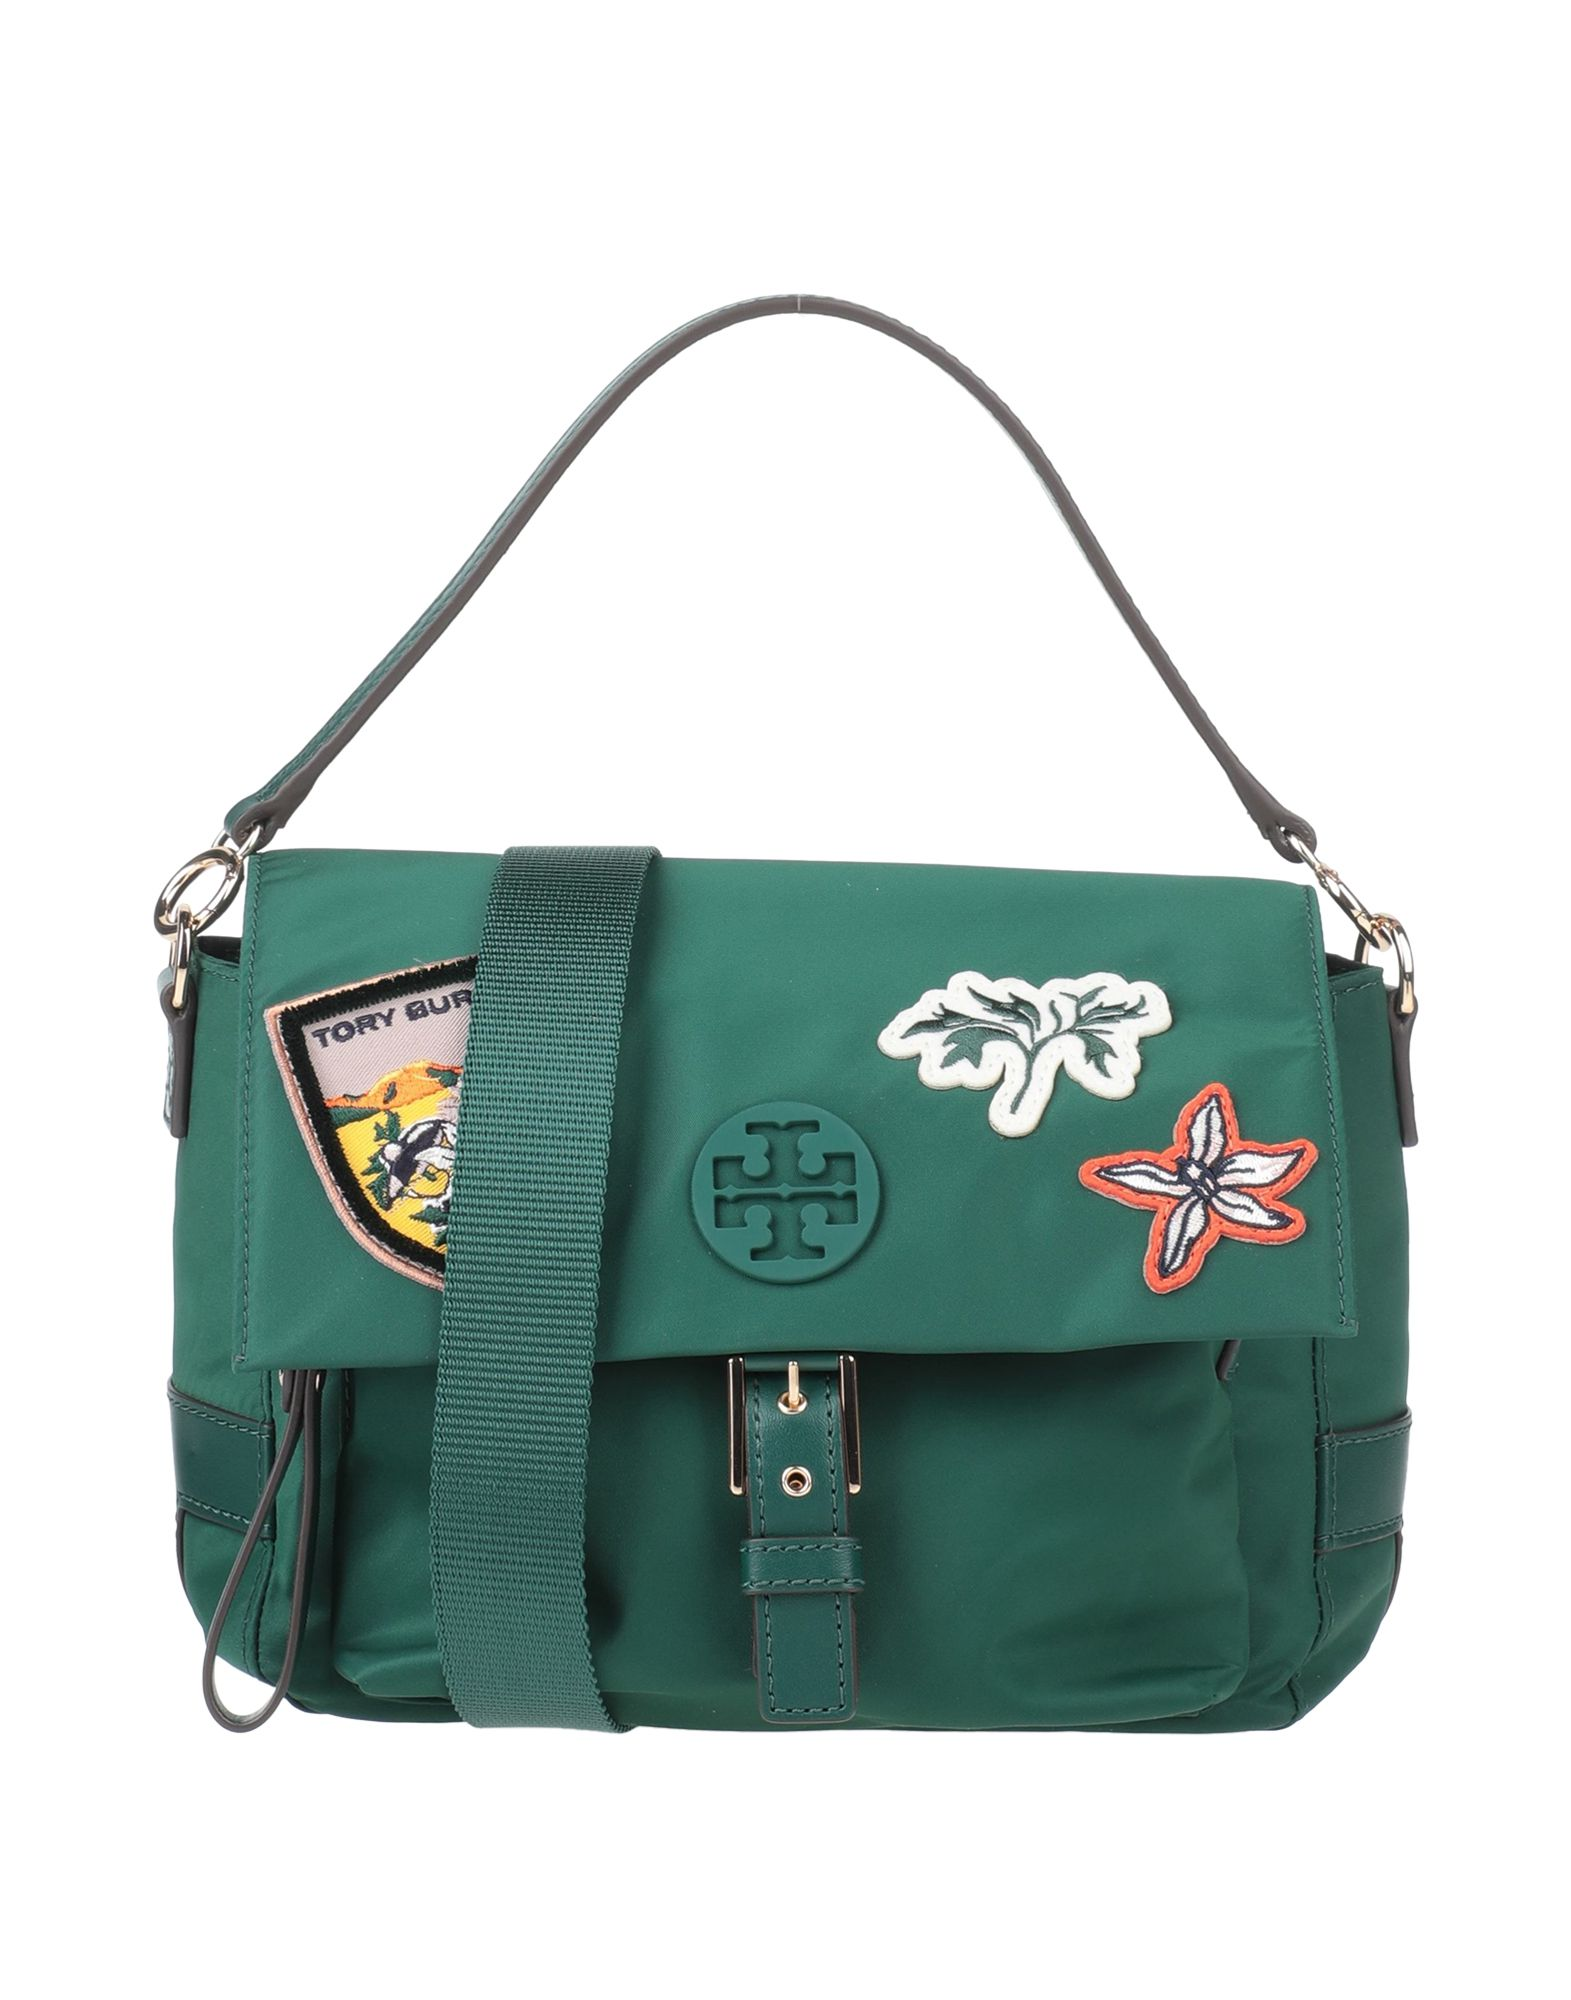 TORY BURCH Cross-body bags - Item 45527511